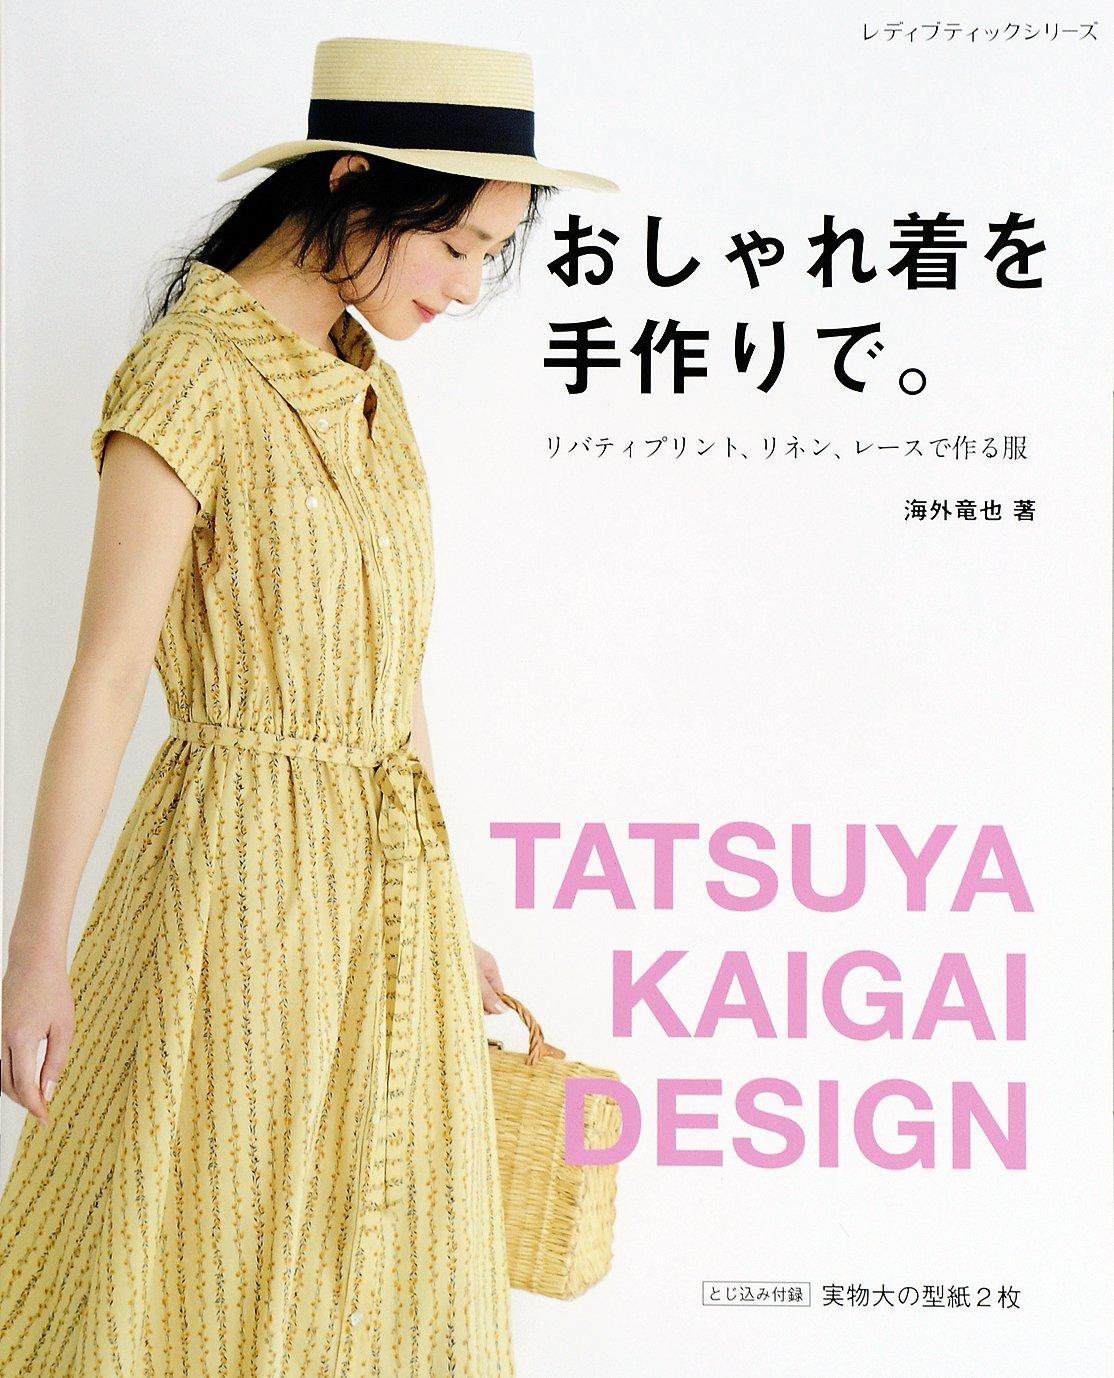 Handmade fashionable clothes